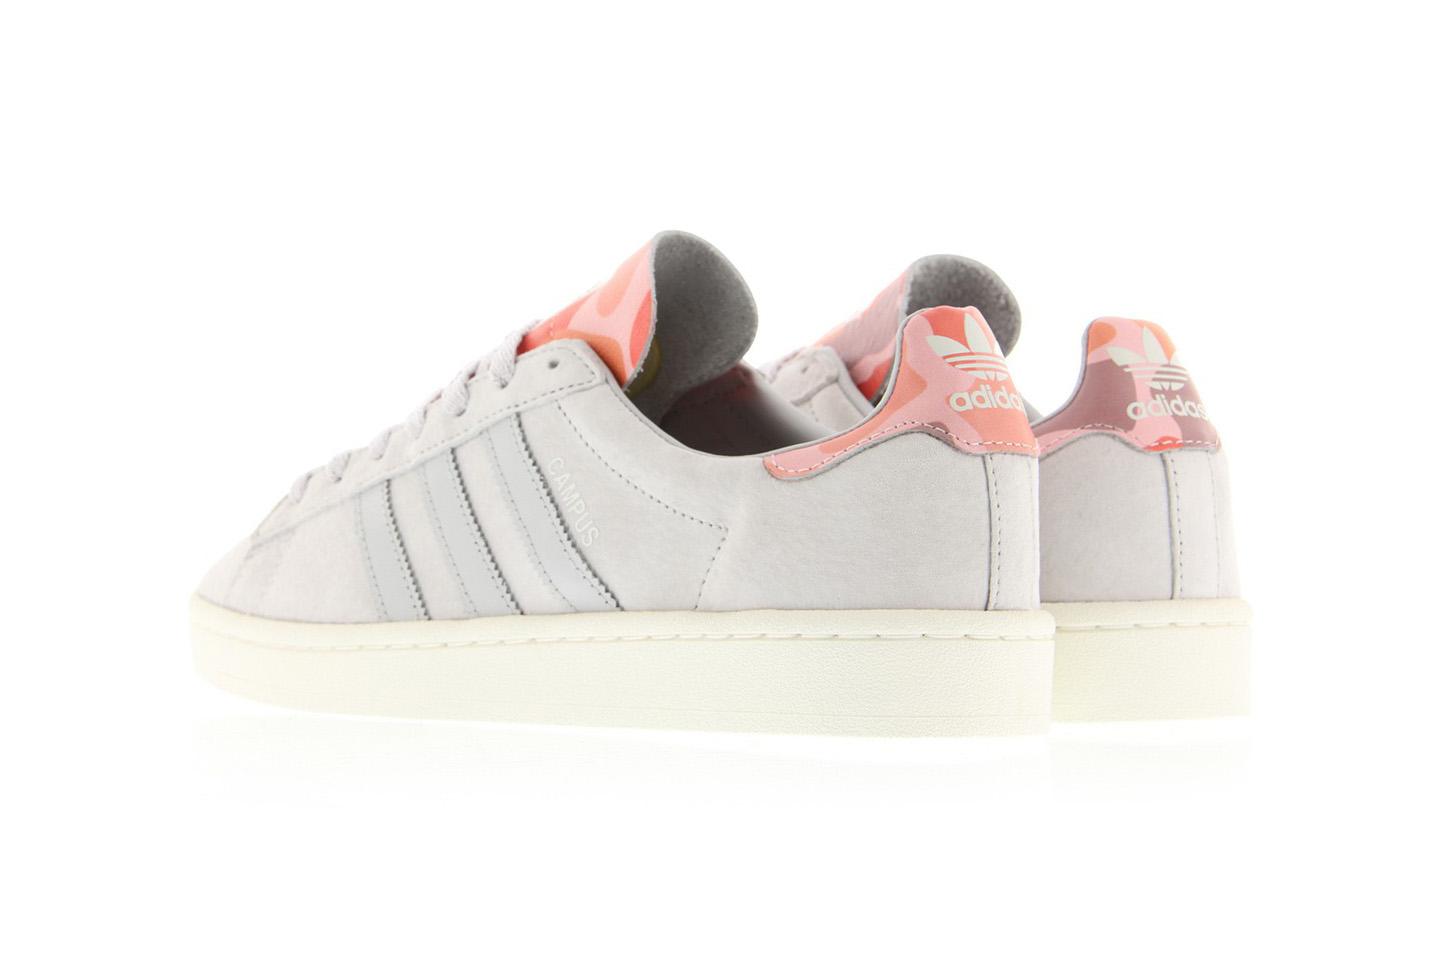 adidas Originals Campus Pink Sun Glow Camo